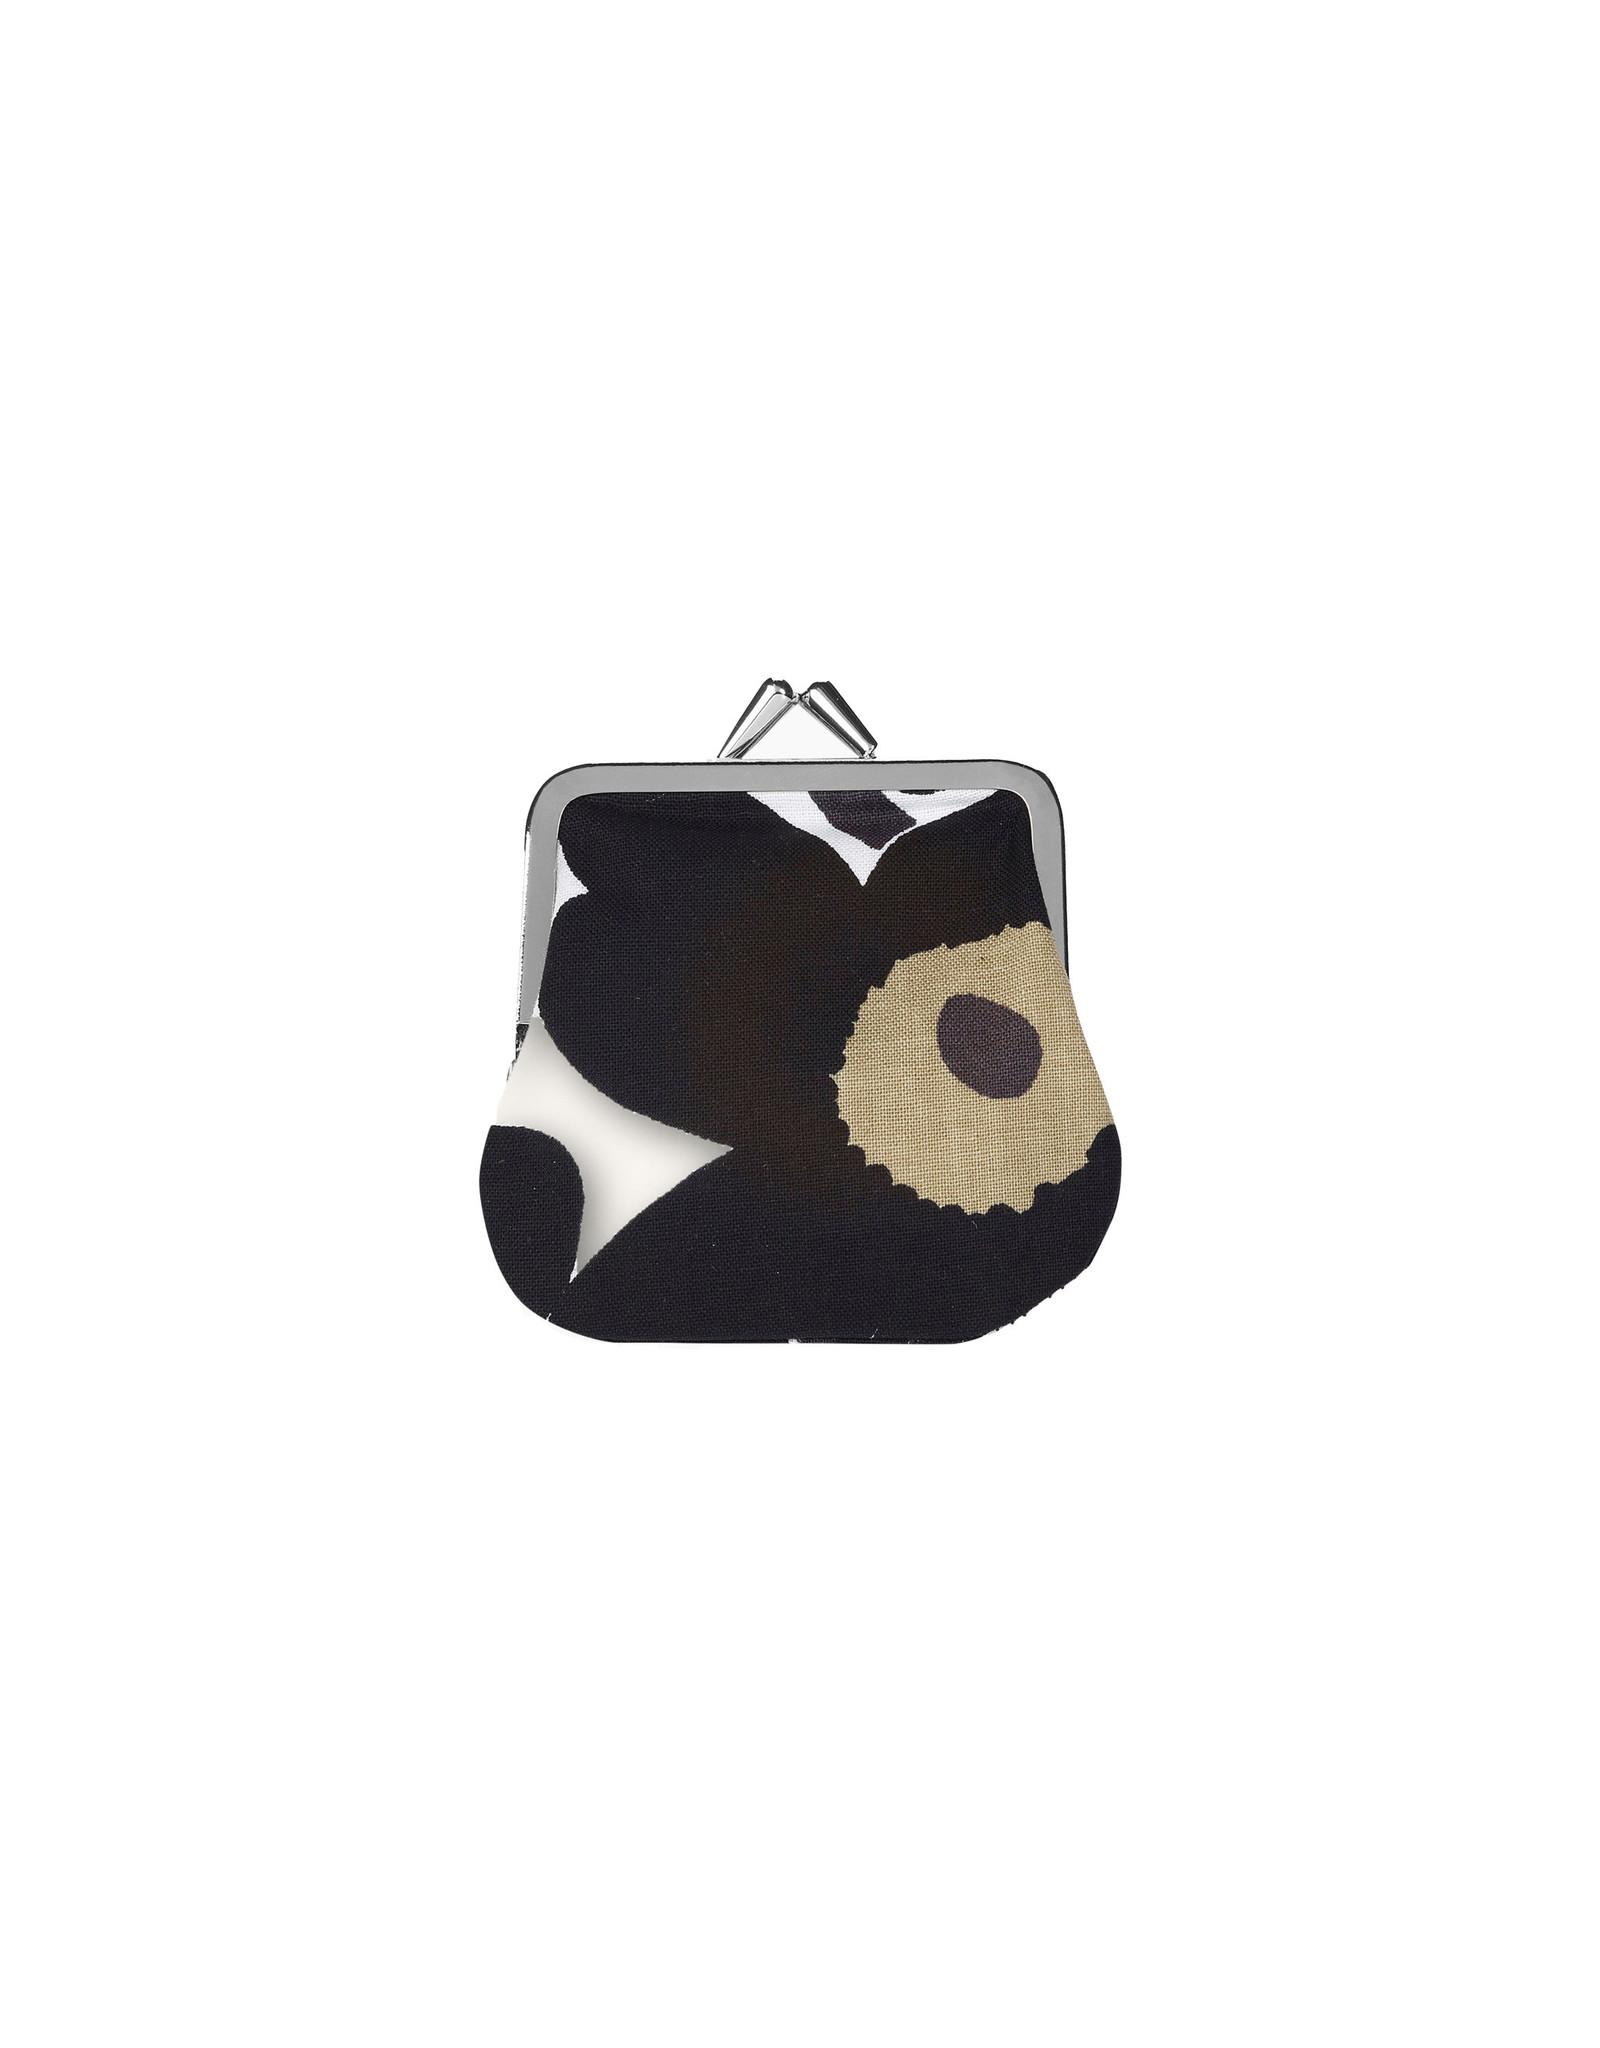 Marimekko Purse, Mini Unikko Kukkaro, Black Olive